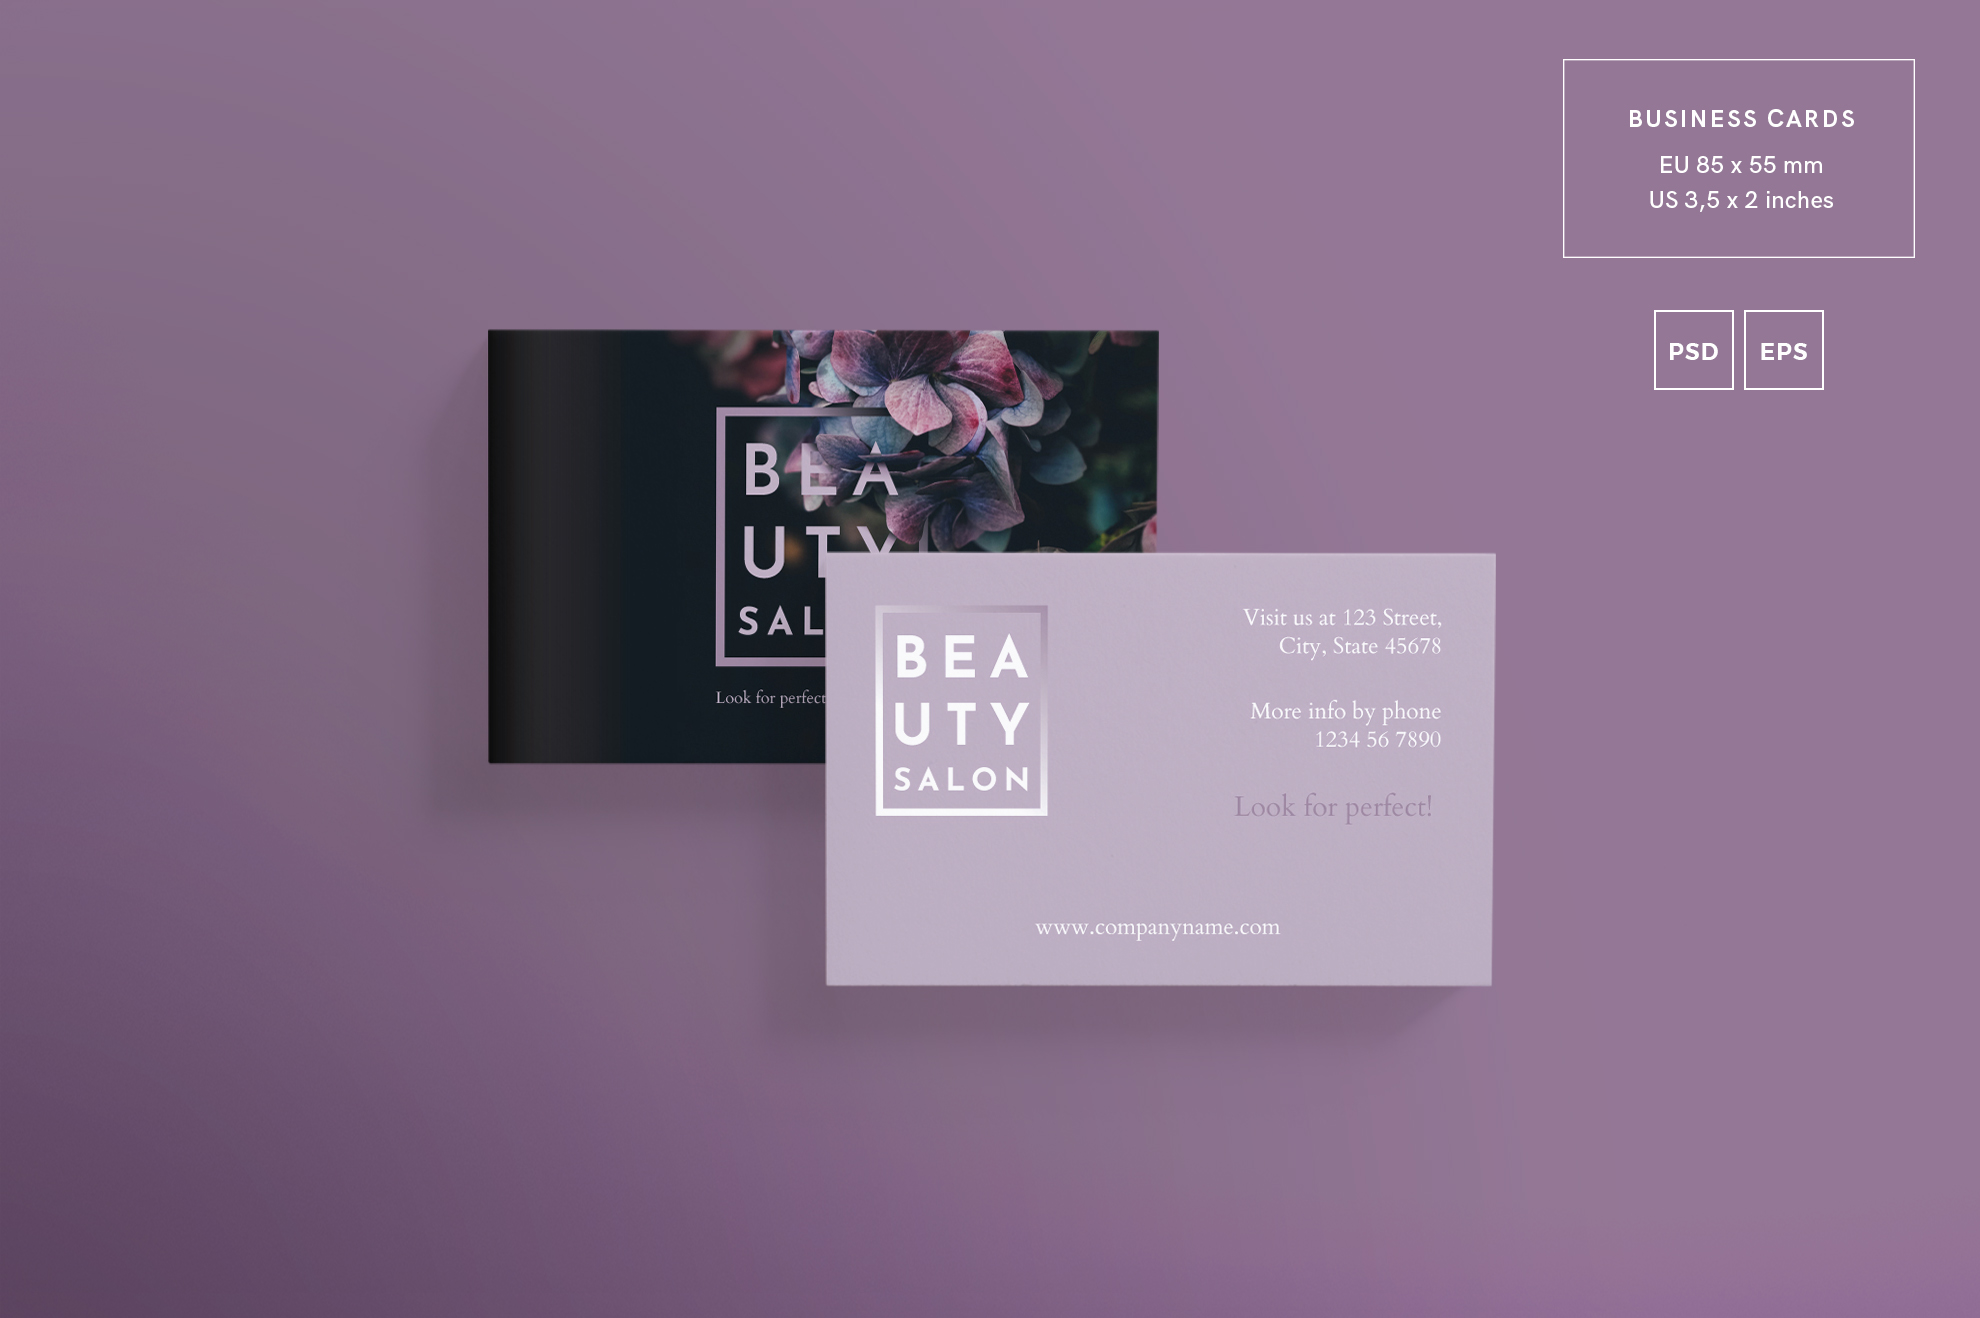 Beauty Salon Business Card Design Templates Kit example image 2